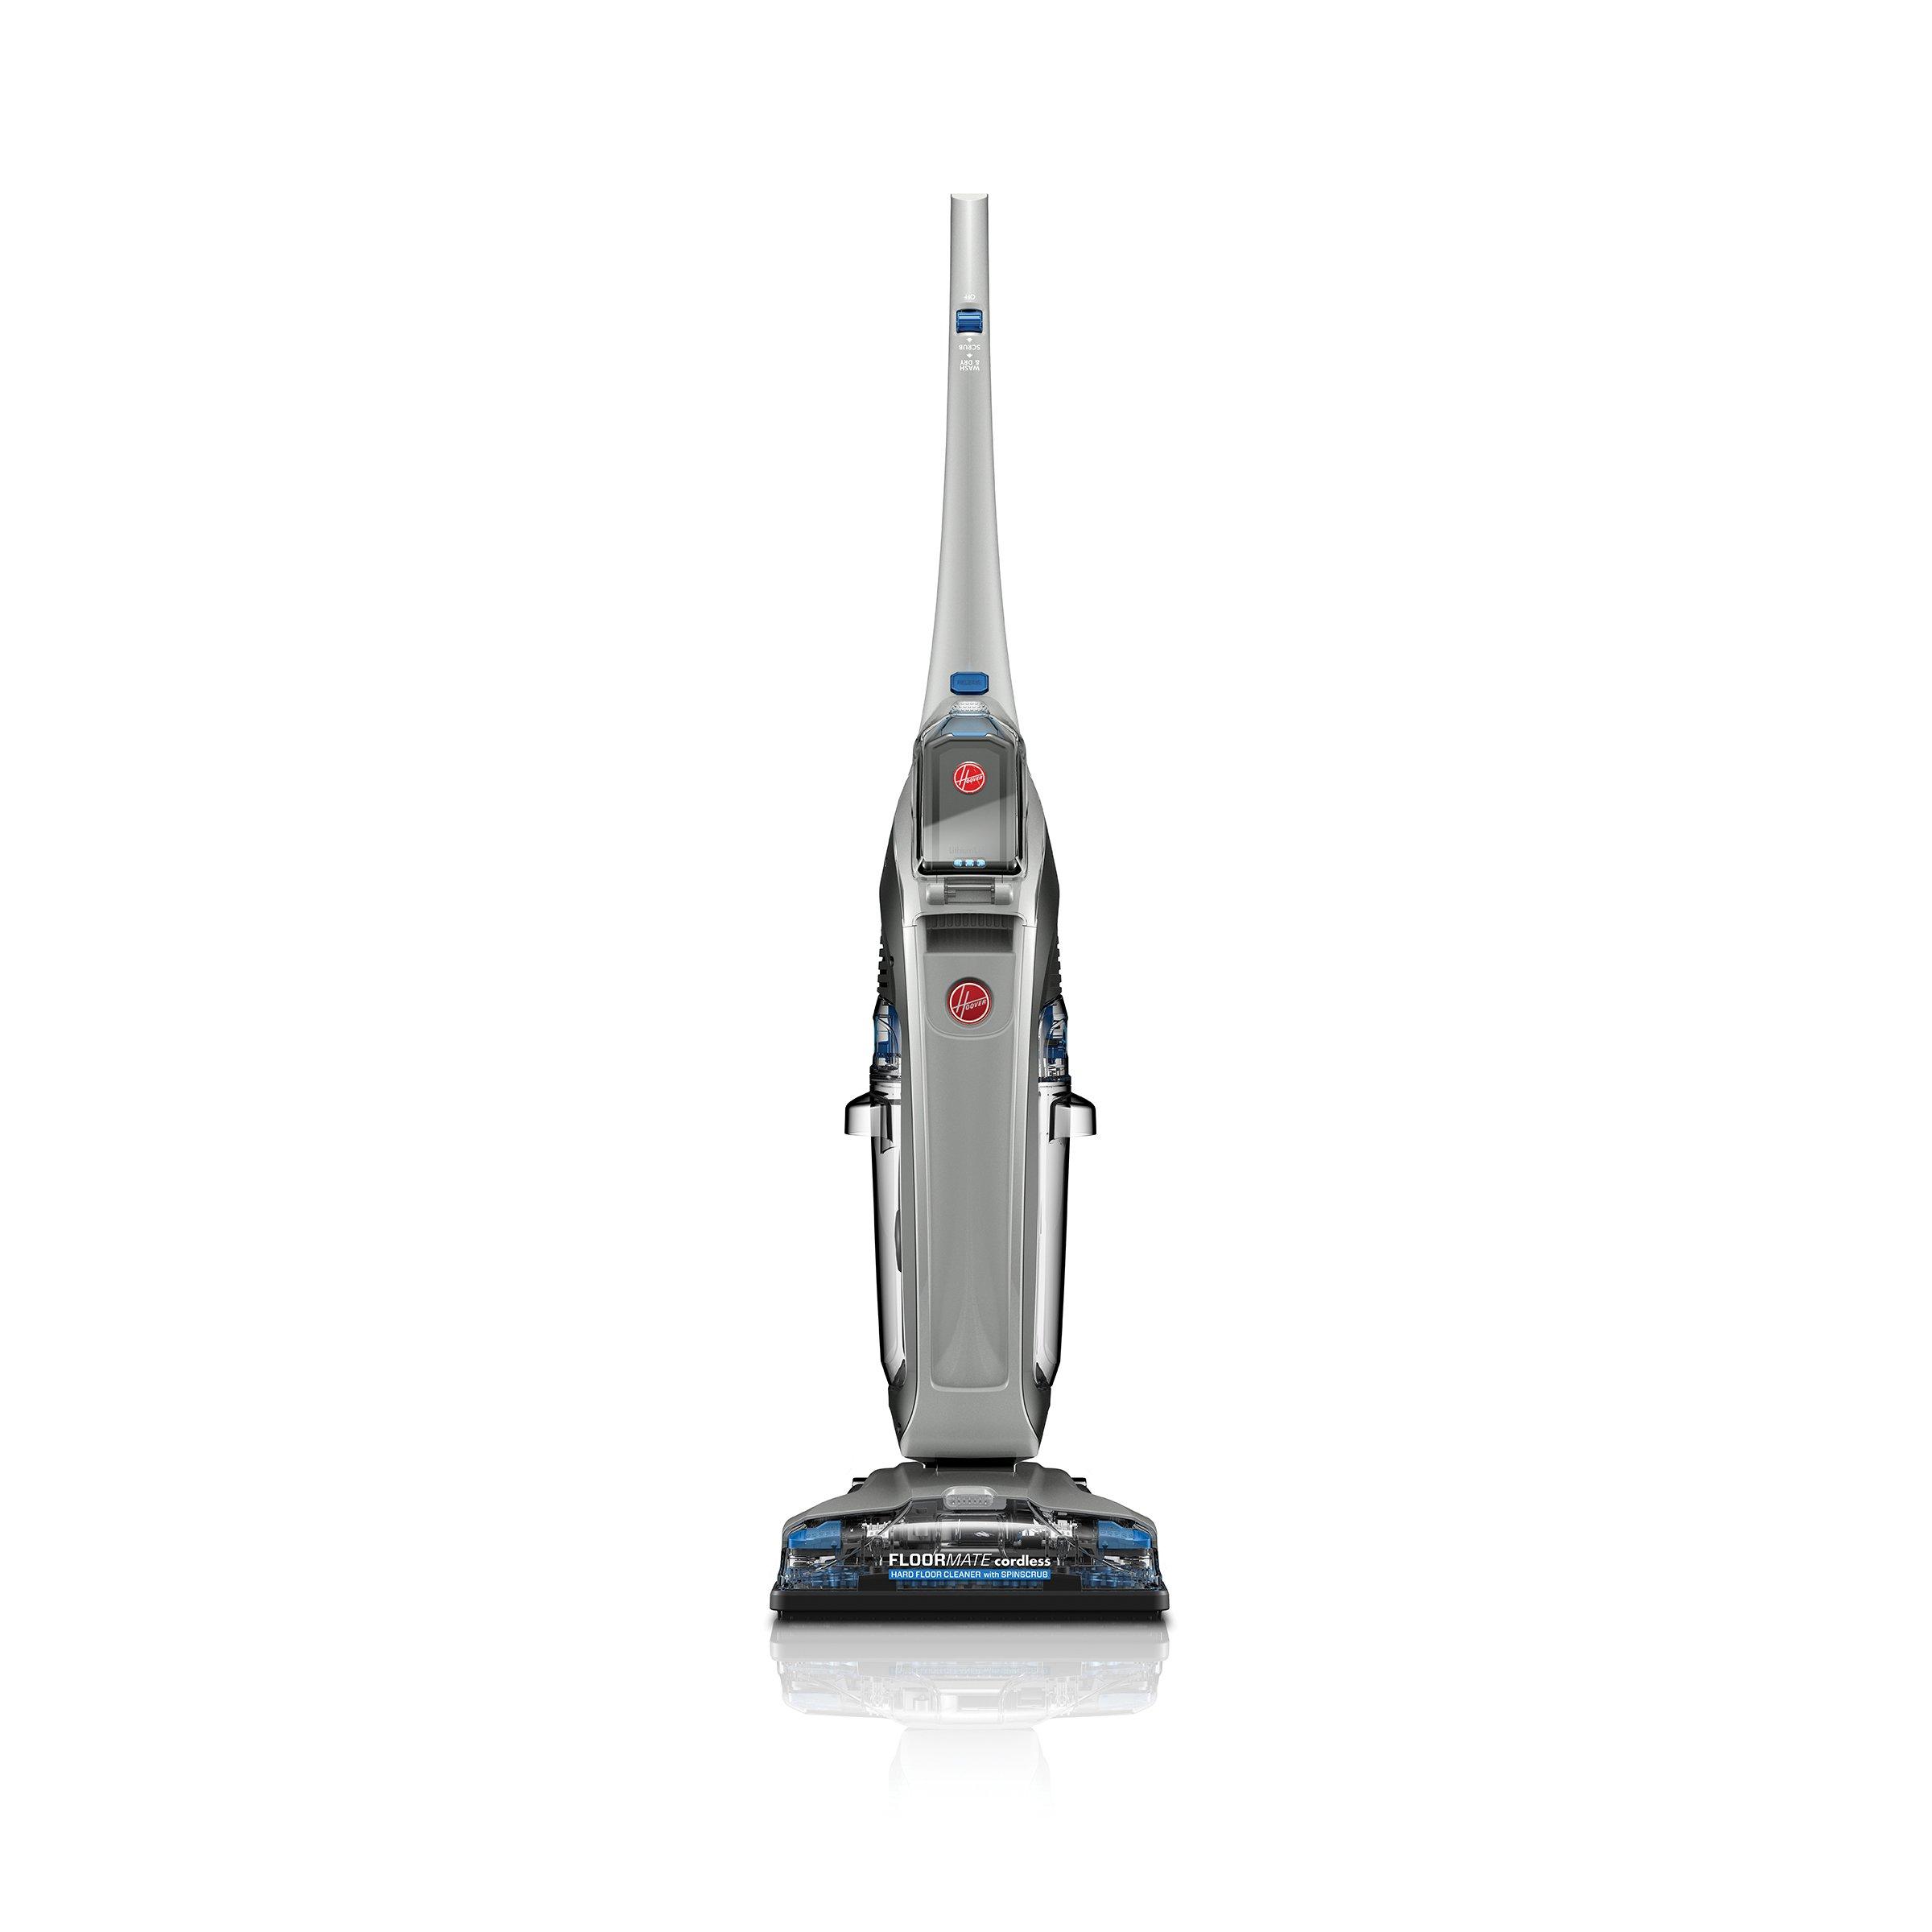 Hoover FloorMate Cordless Hard Floor Cleaner, BH55100PC